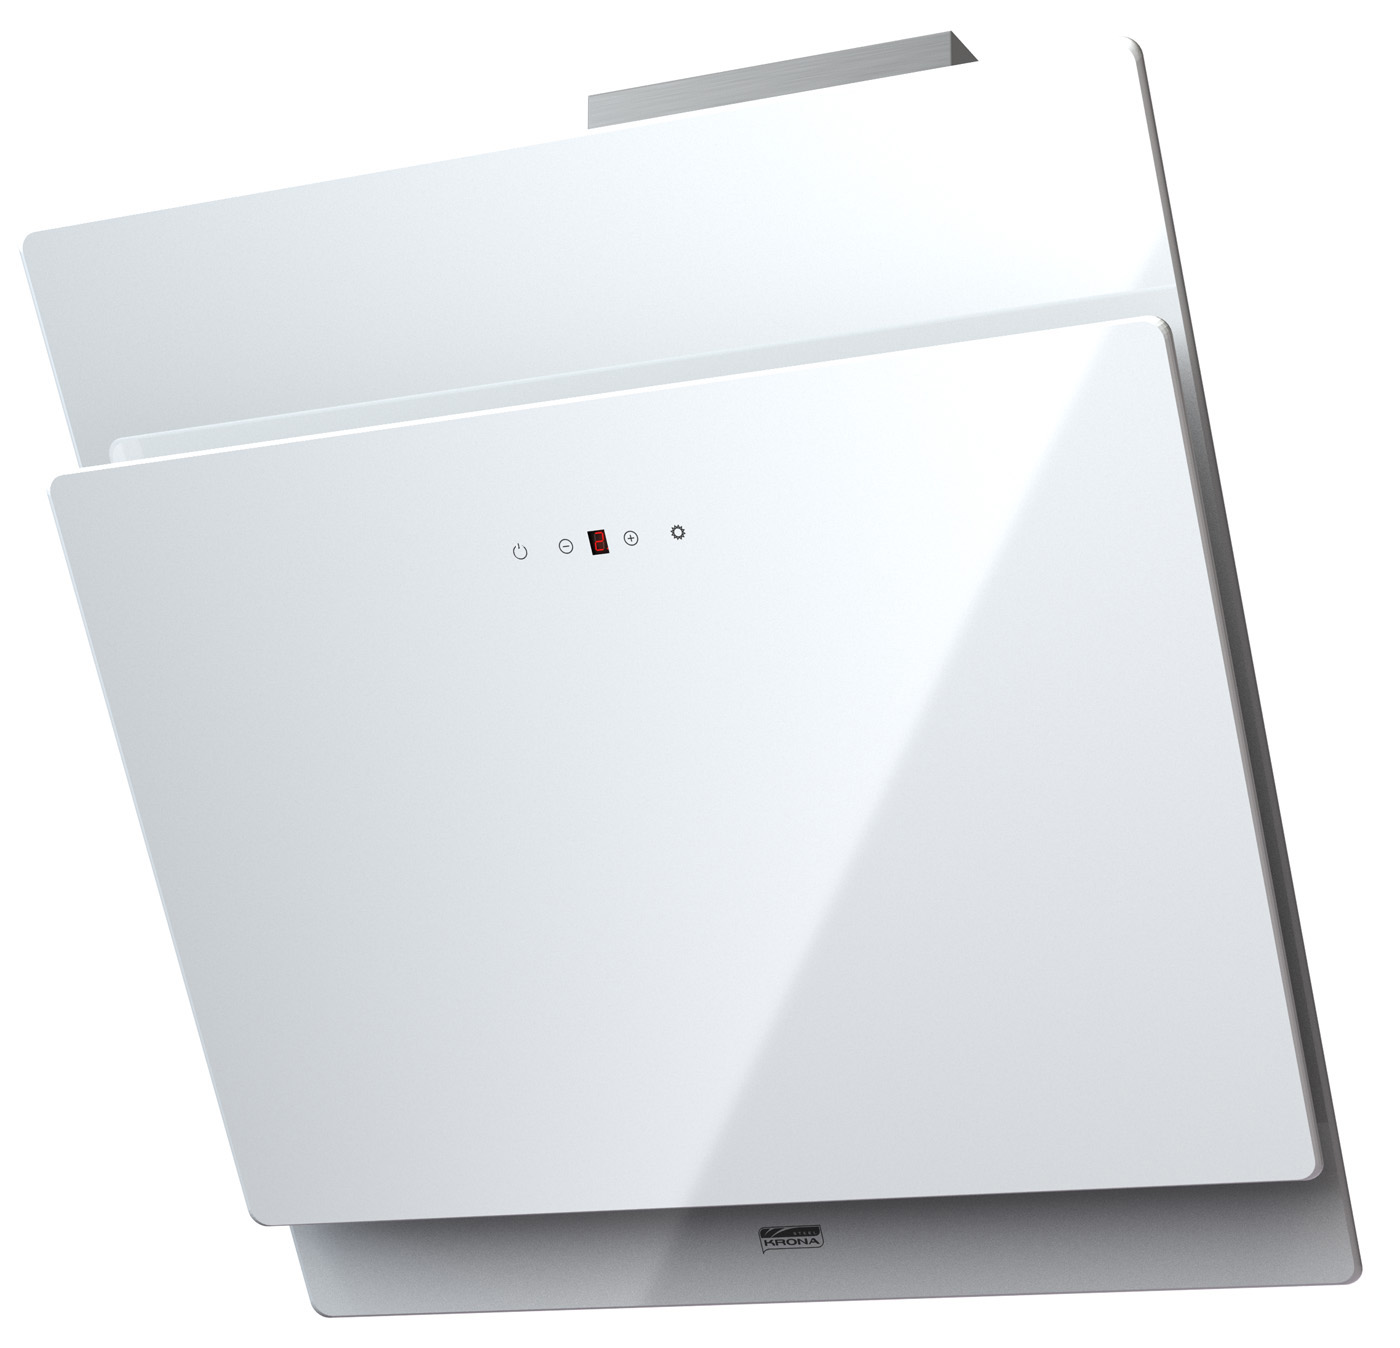 ANGELICA 600 white sensor, стоимость 18 724 руб.